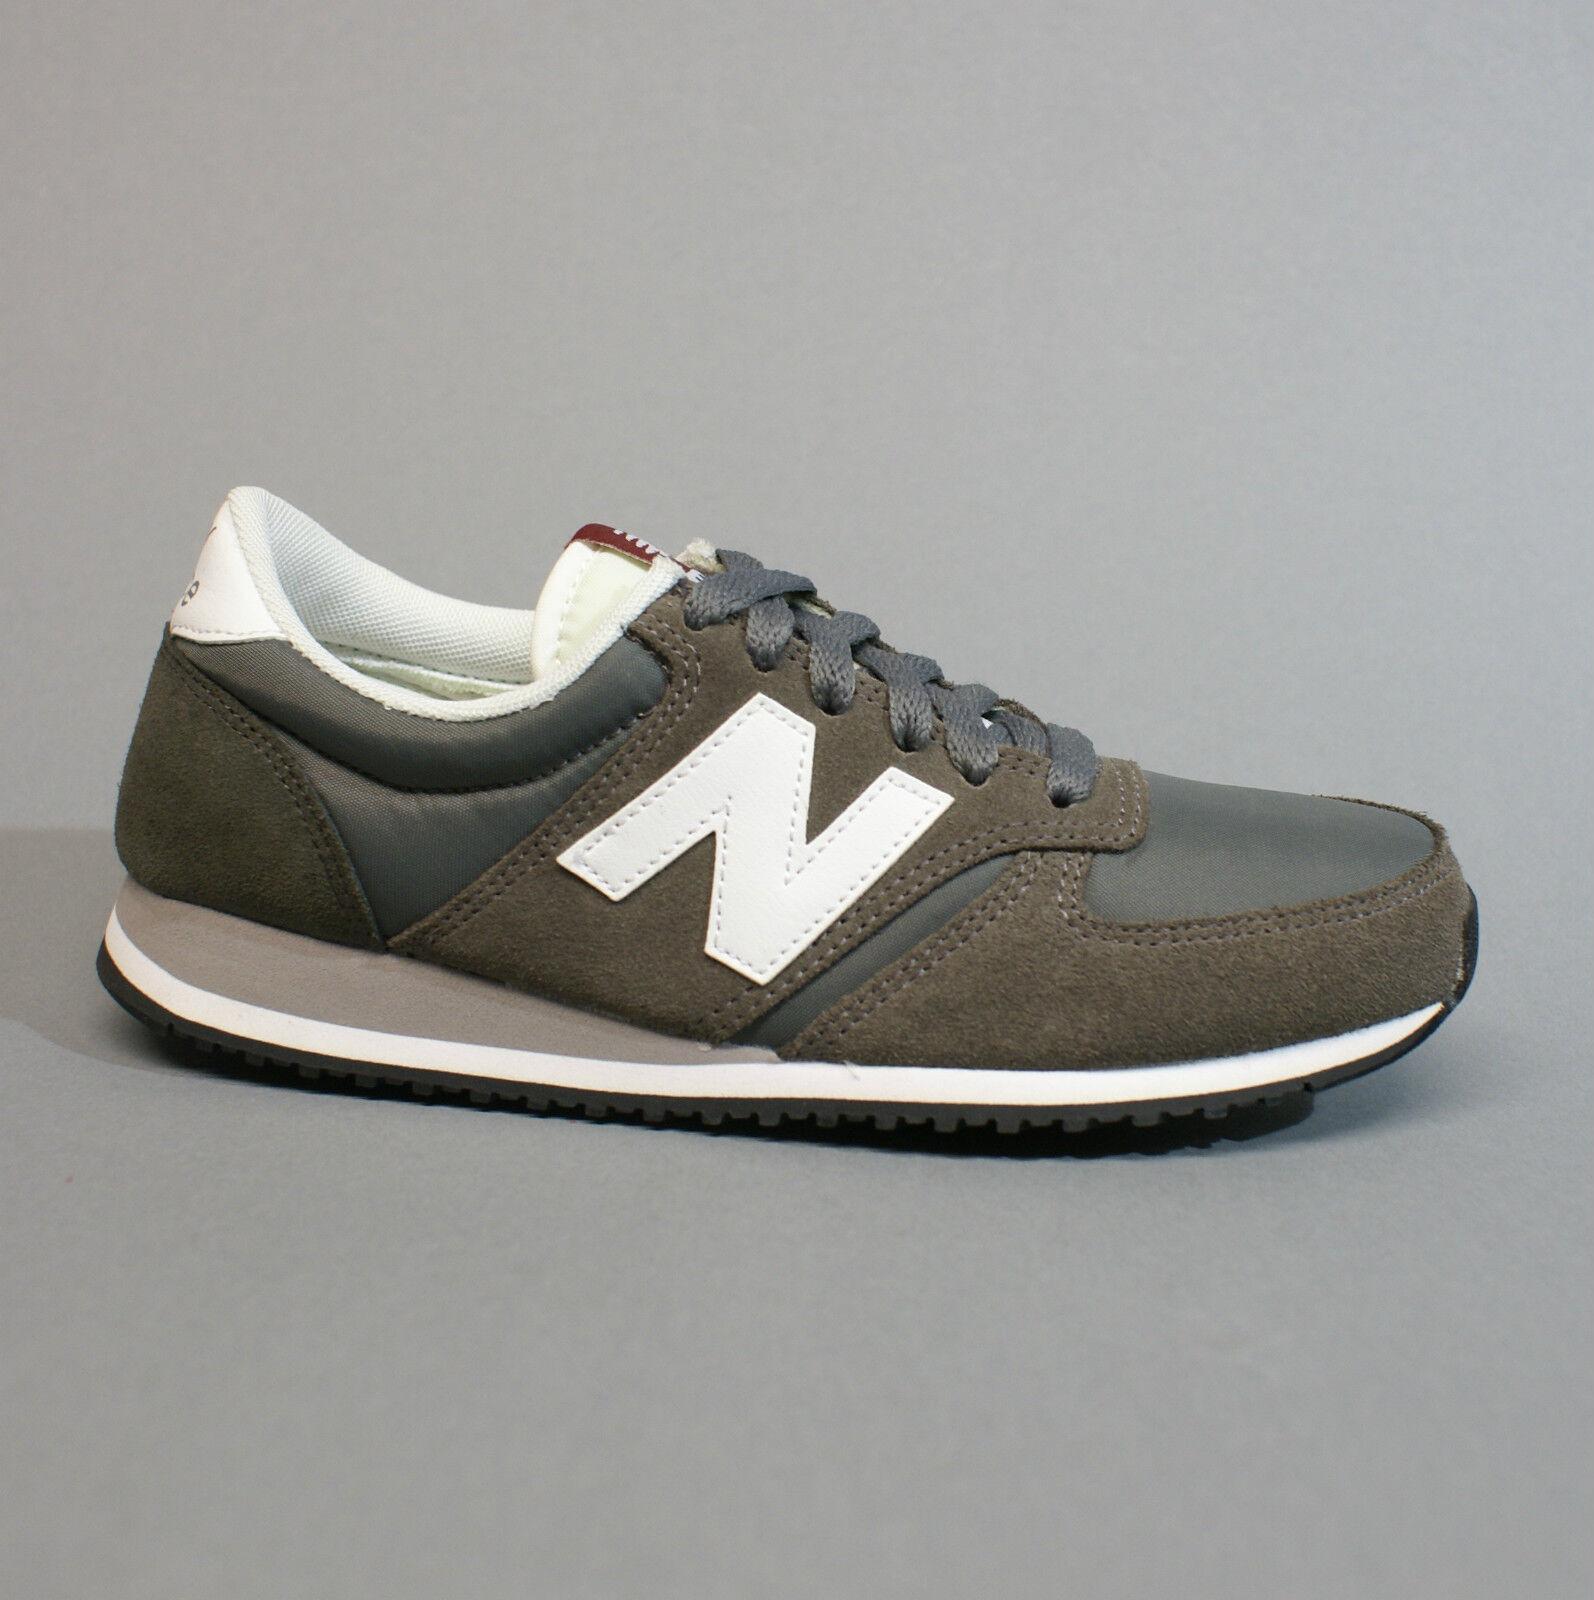 New Balance U420CGW grau Weiß Schuhe Turnschuhe Turnschuhe grau weiß 36  40,5